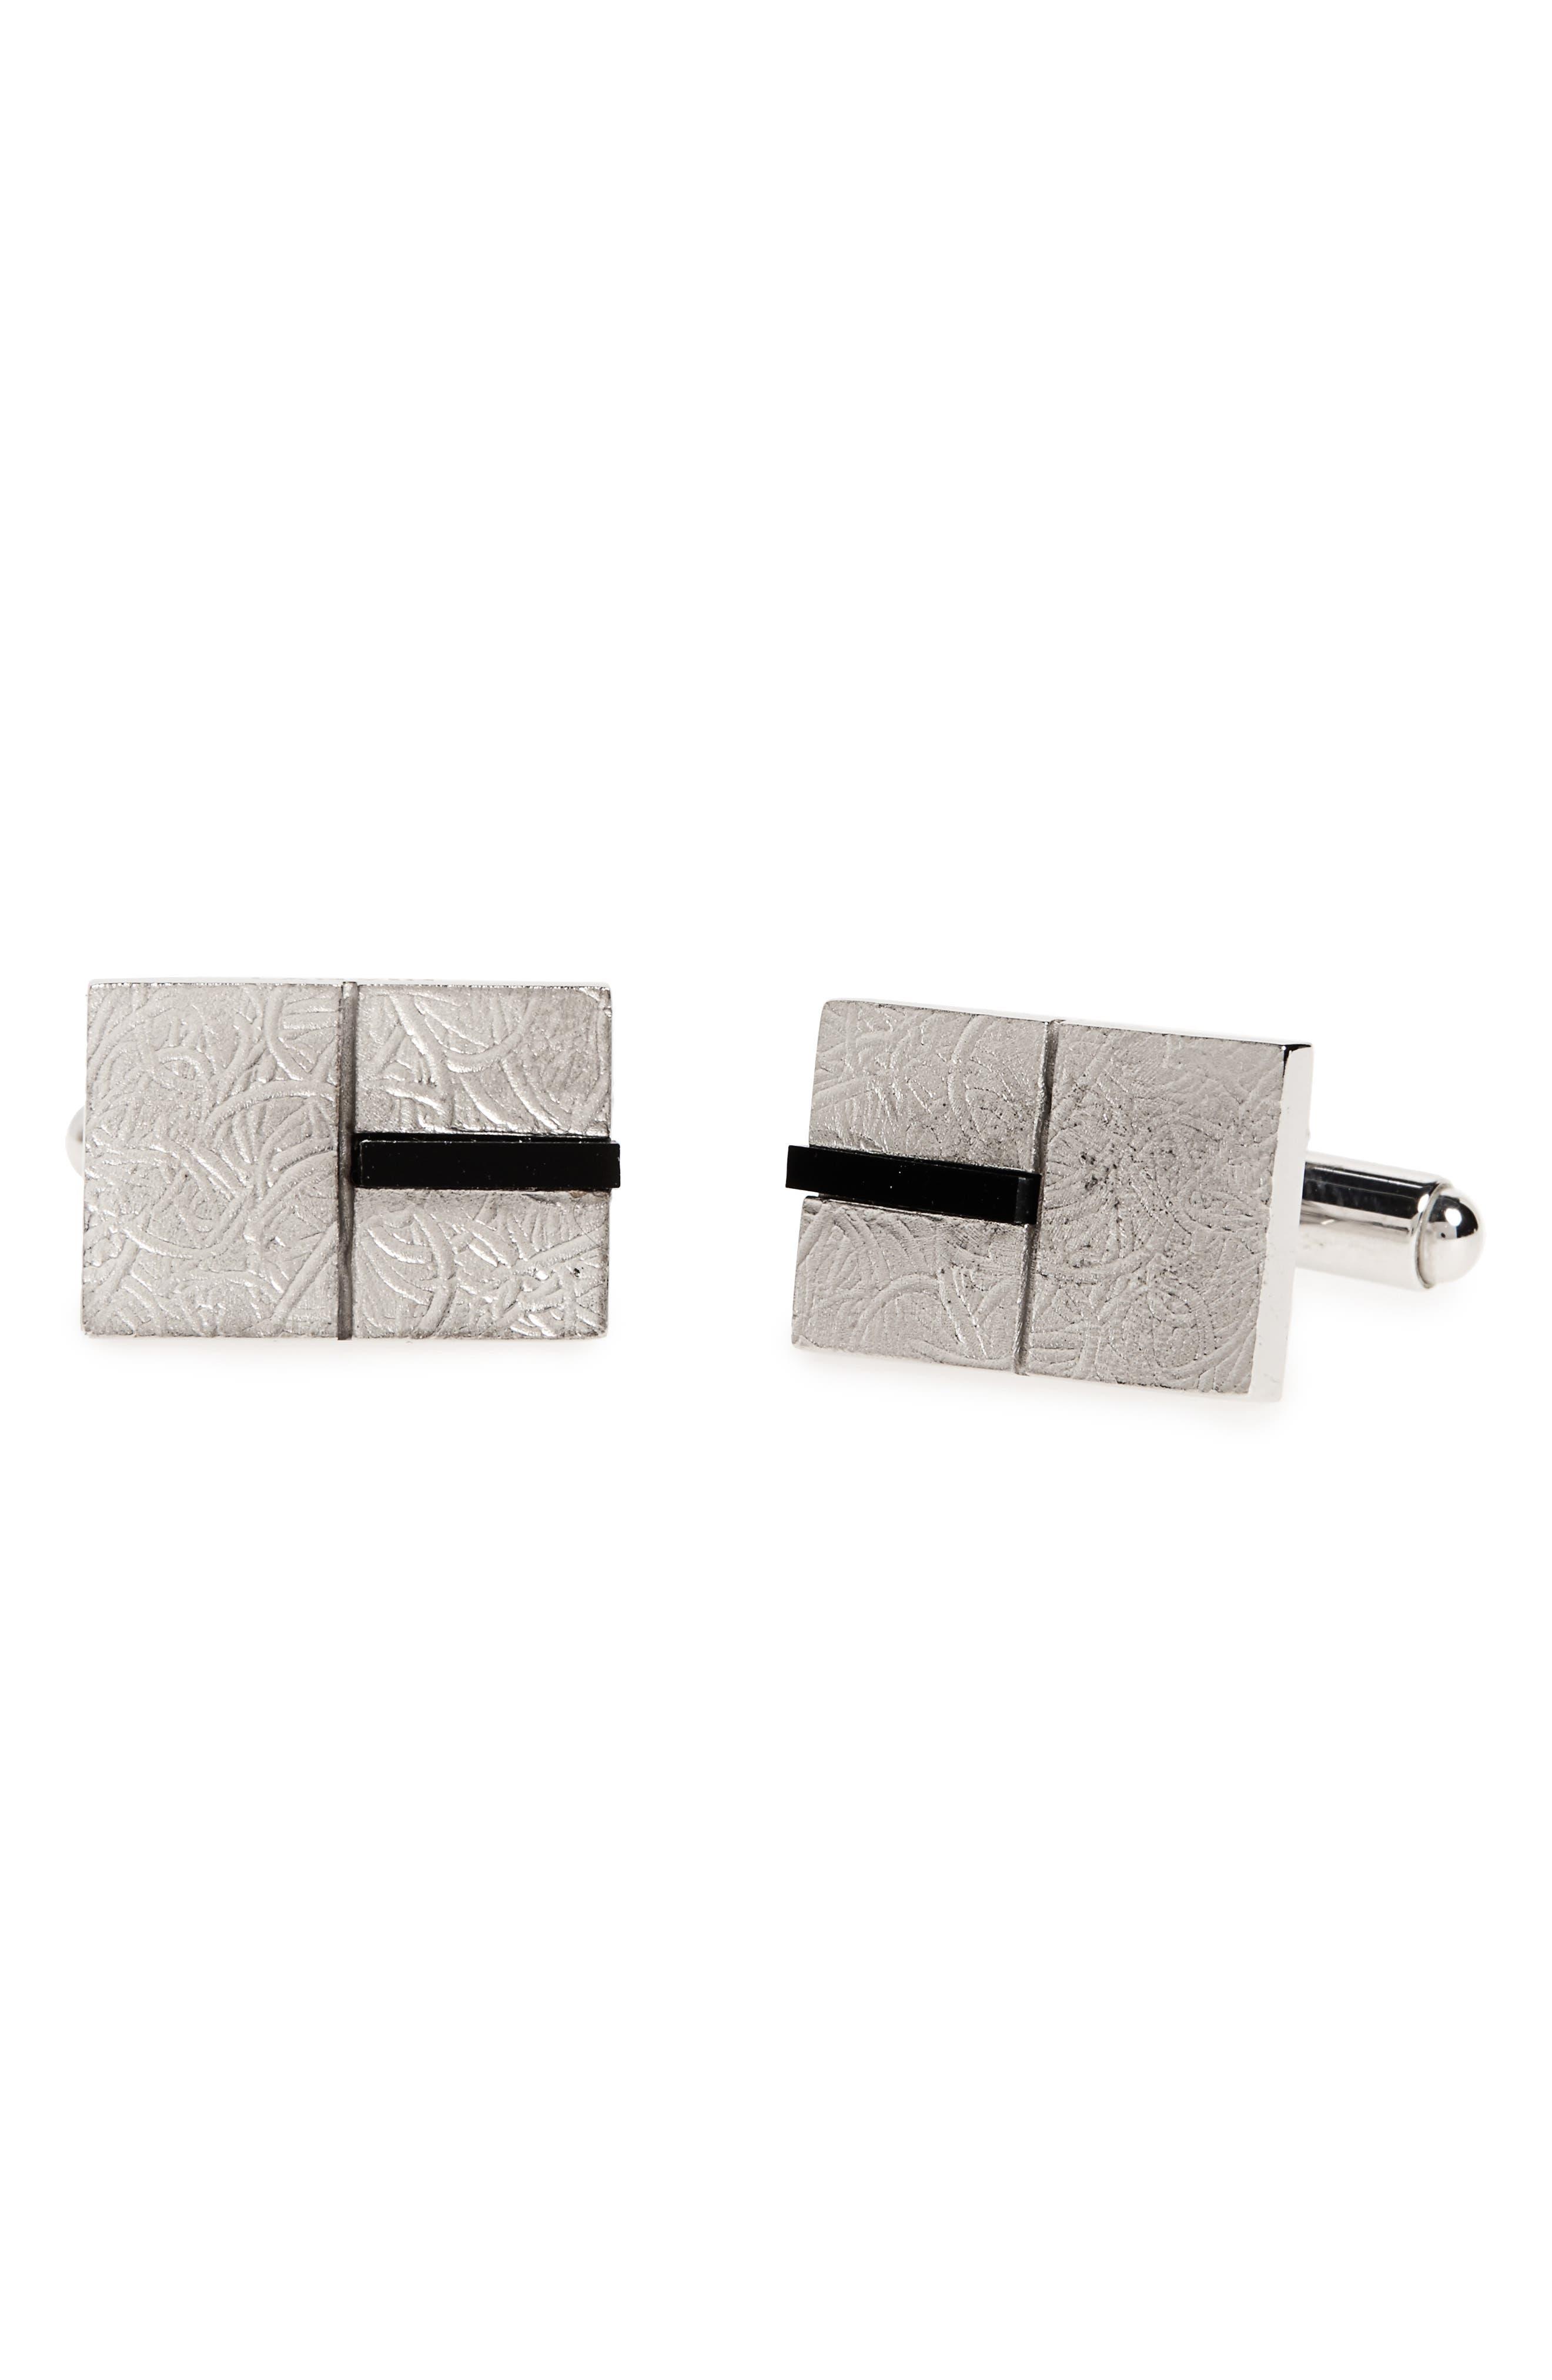 Main Image - Lanvin Squares Cuff Links